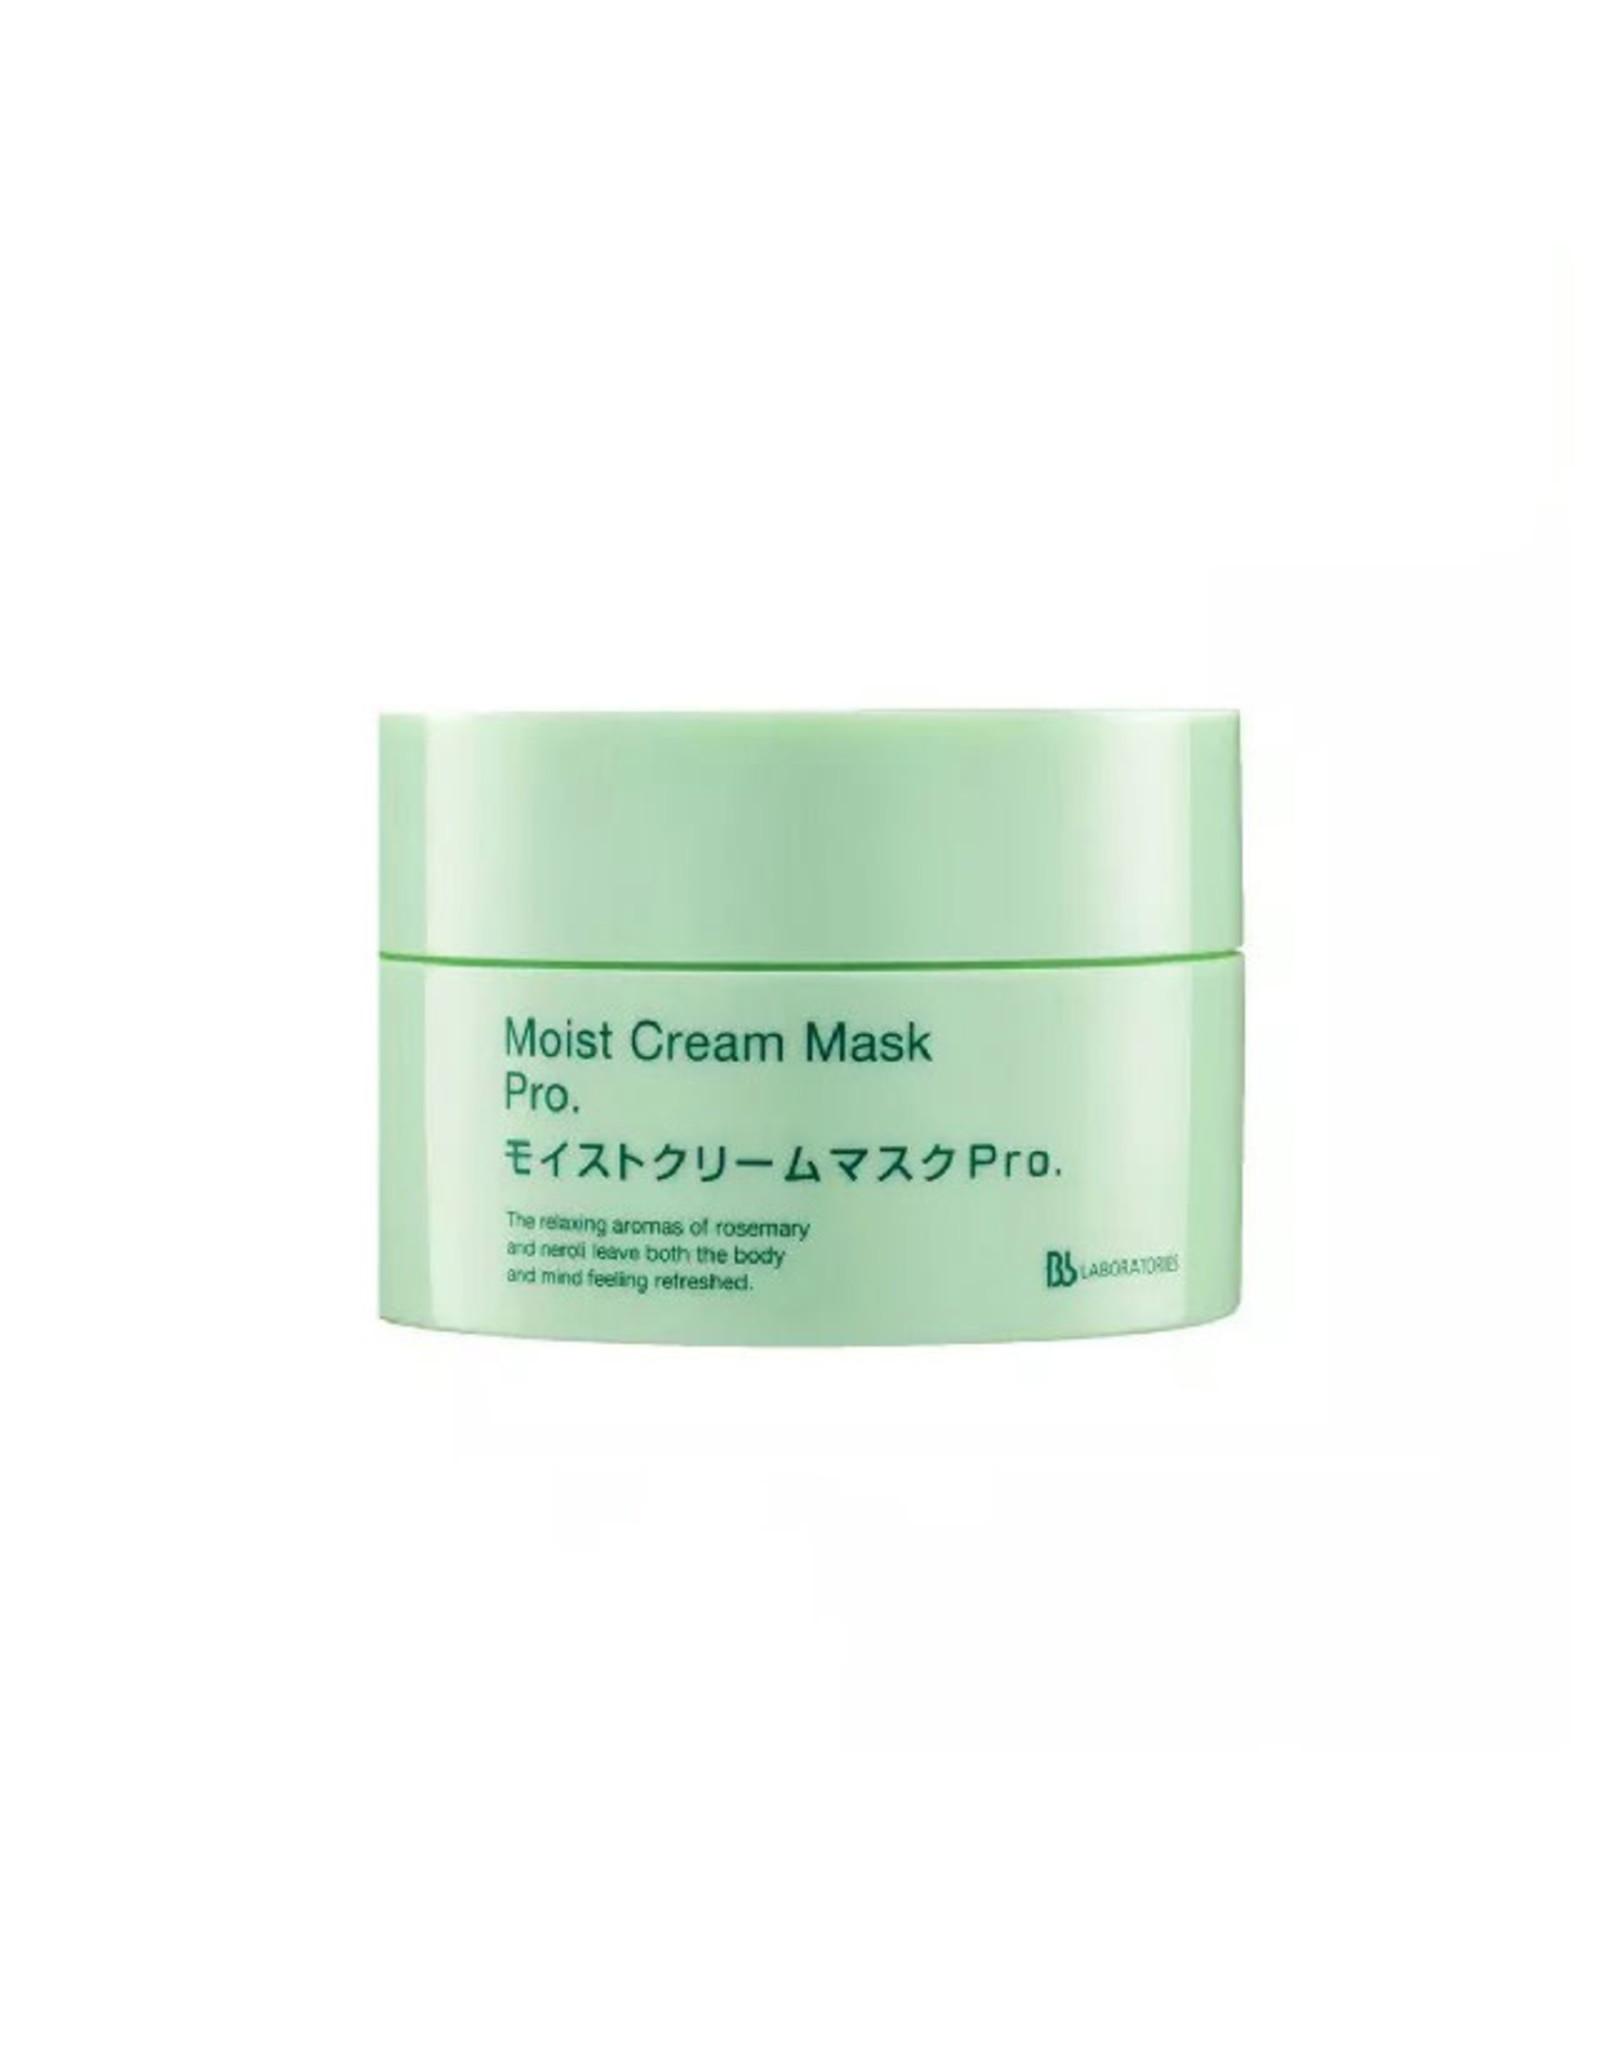 BB Laboratories BBLab PH Moist Cream Mask Pro